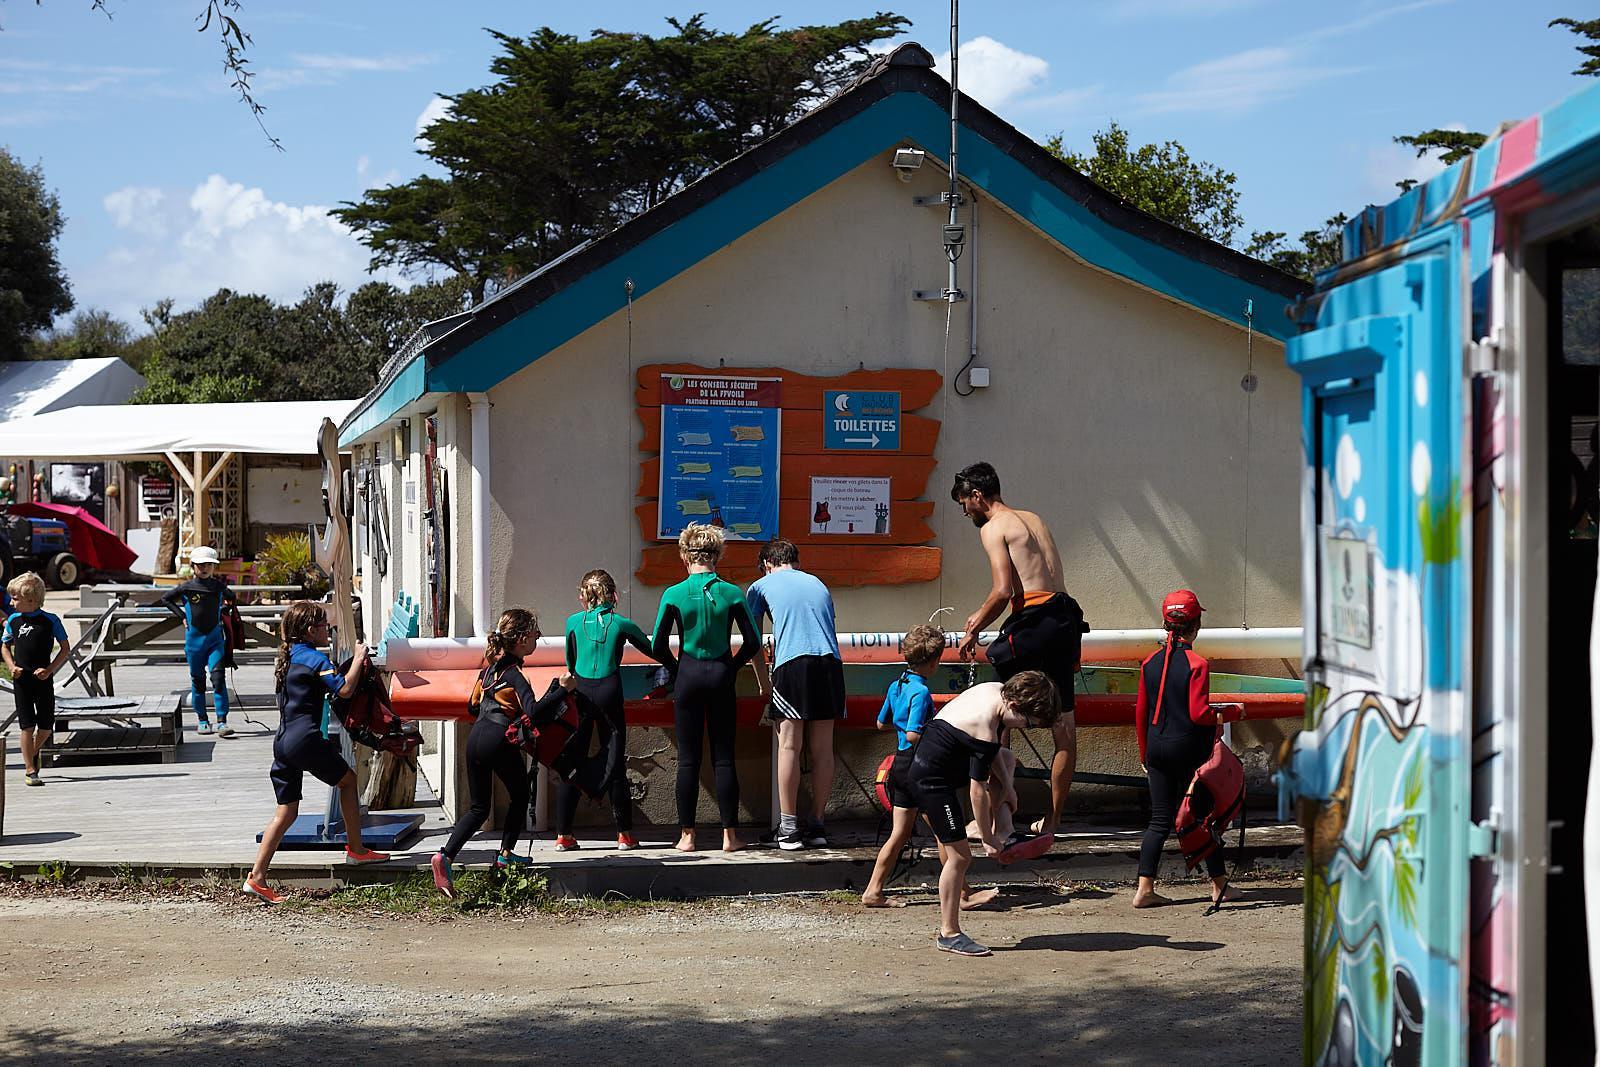 Club Nautique du Rohu - The rinsing of the equipment